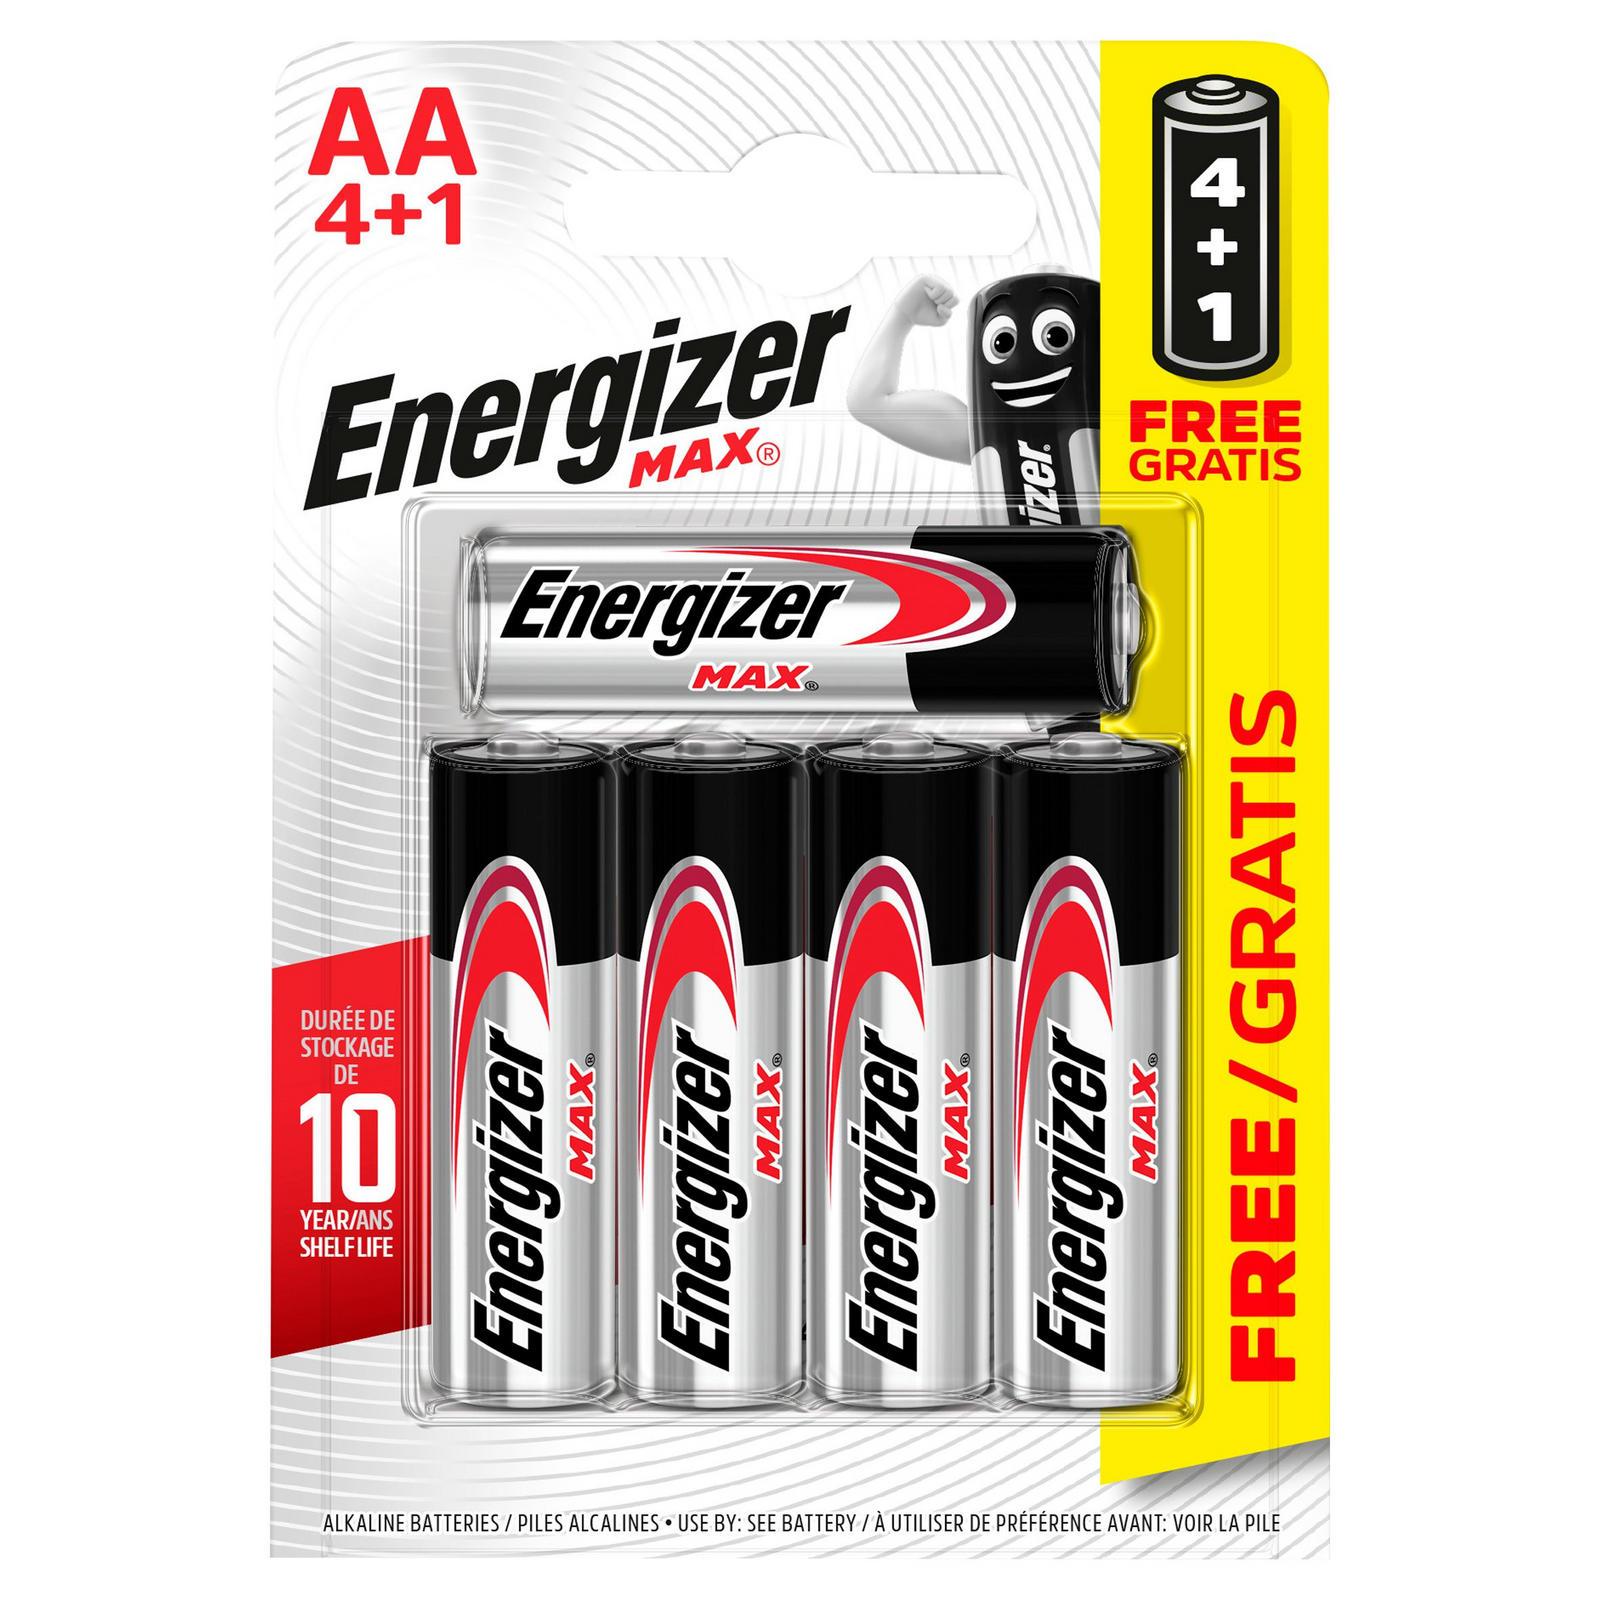 Energizer MAX® Alkaline AA Batteries 4 + 1 Free Pack